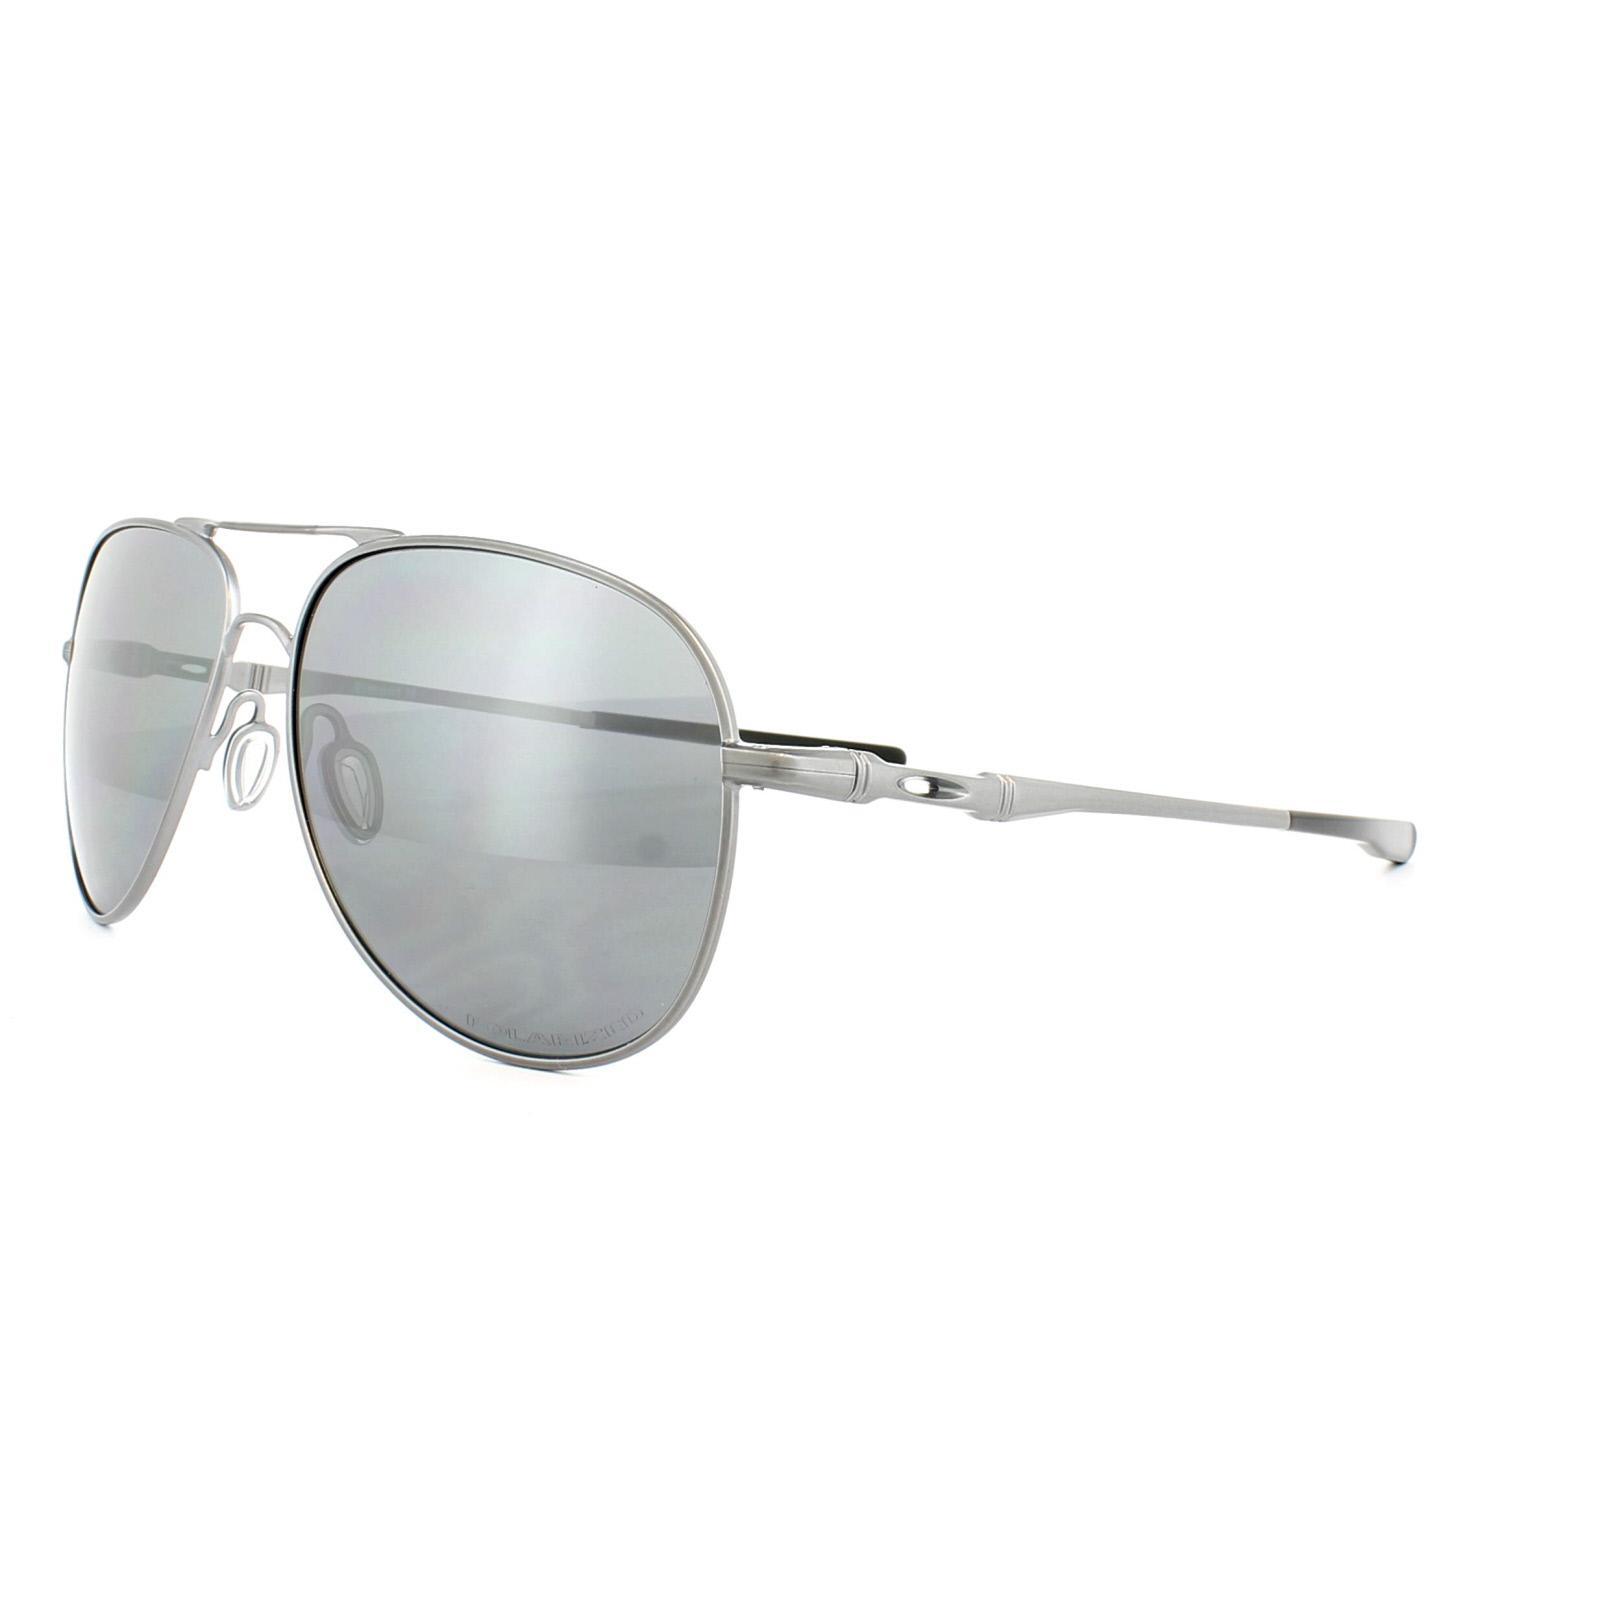 7bdd15f428e ... canada sentinel oakley sunglasses elmont m oo4119 06 lead black iridium  polarized be6dc 5a295 ...